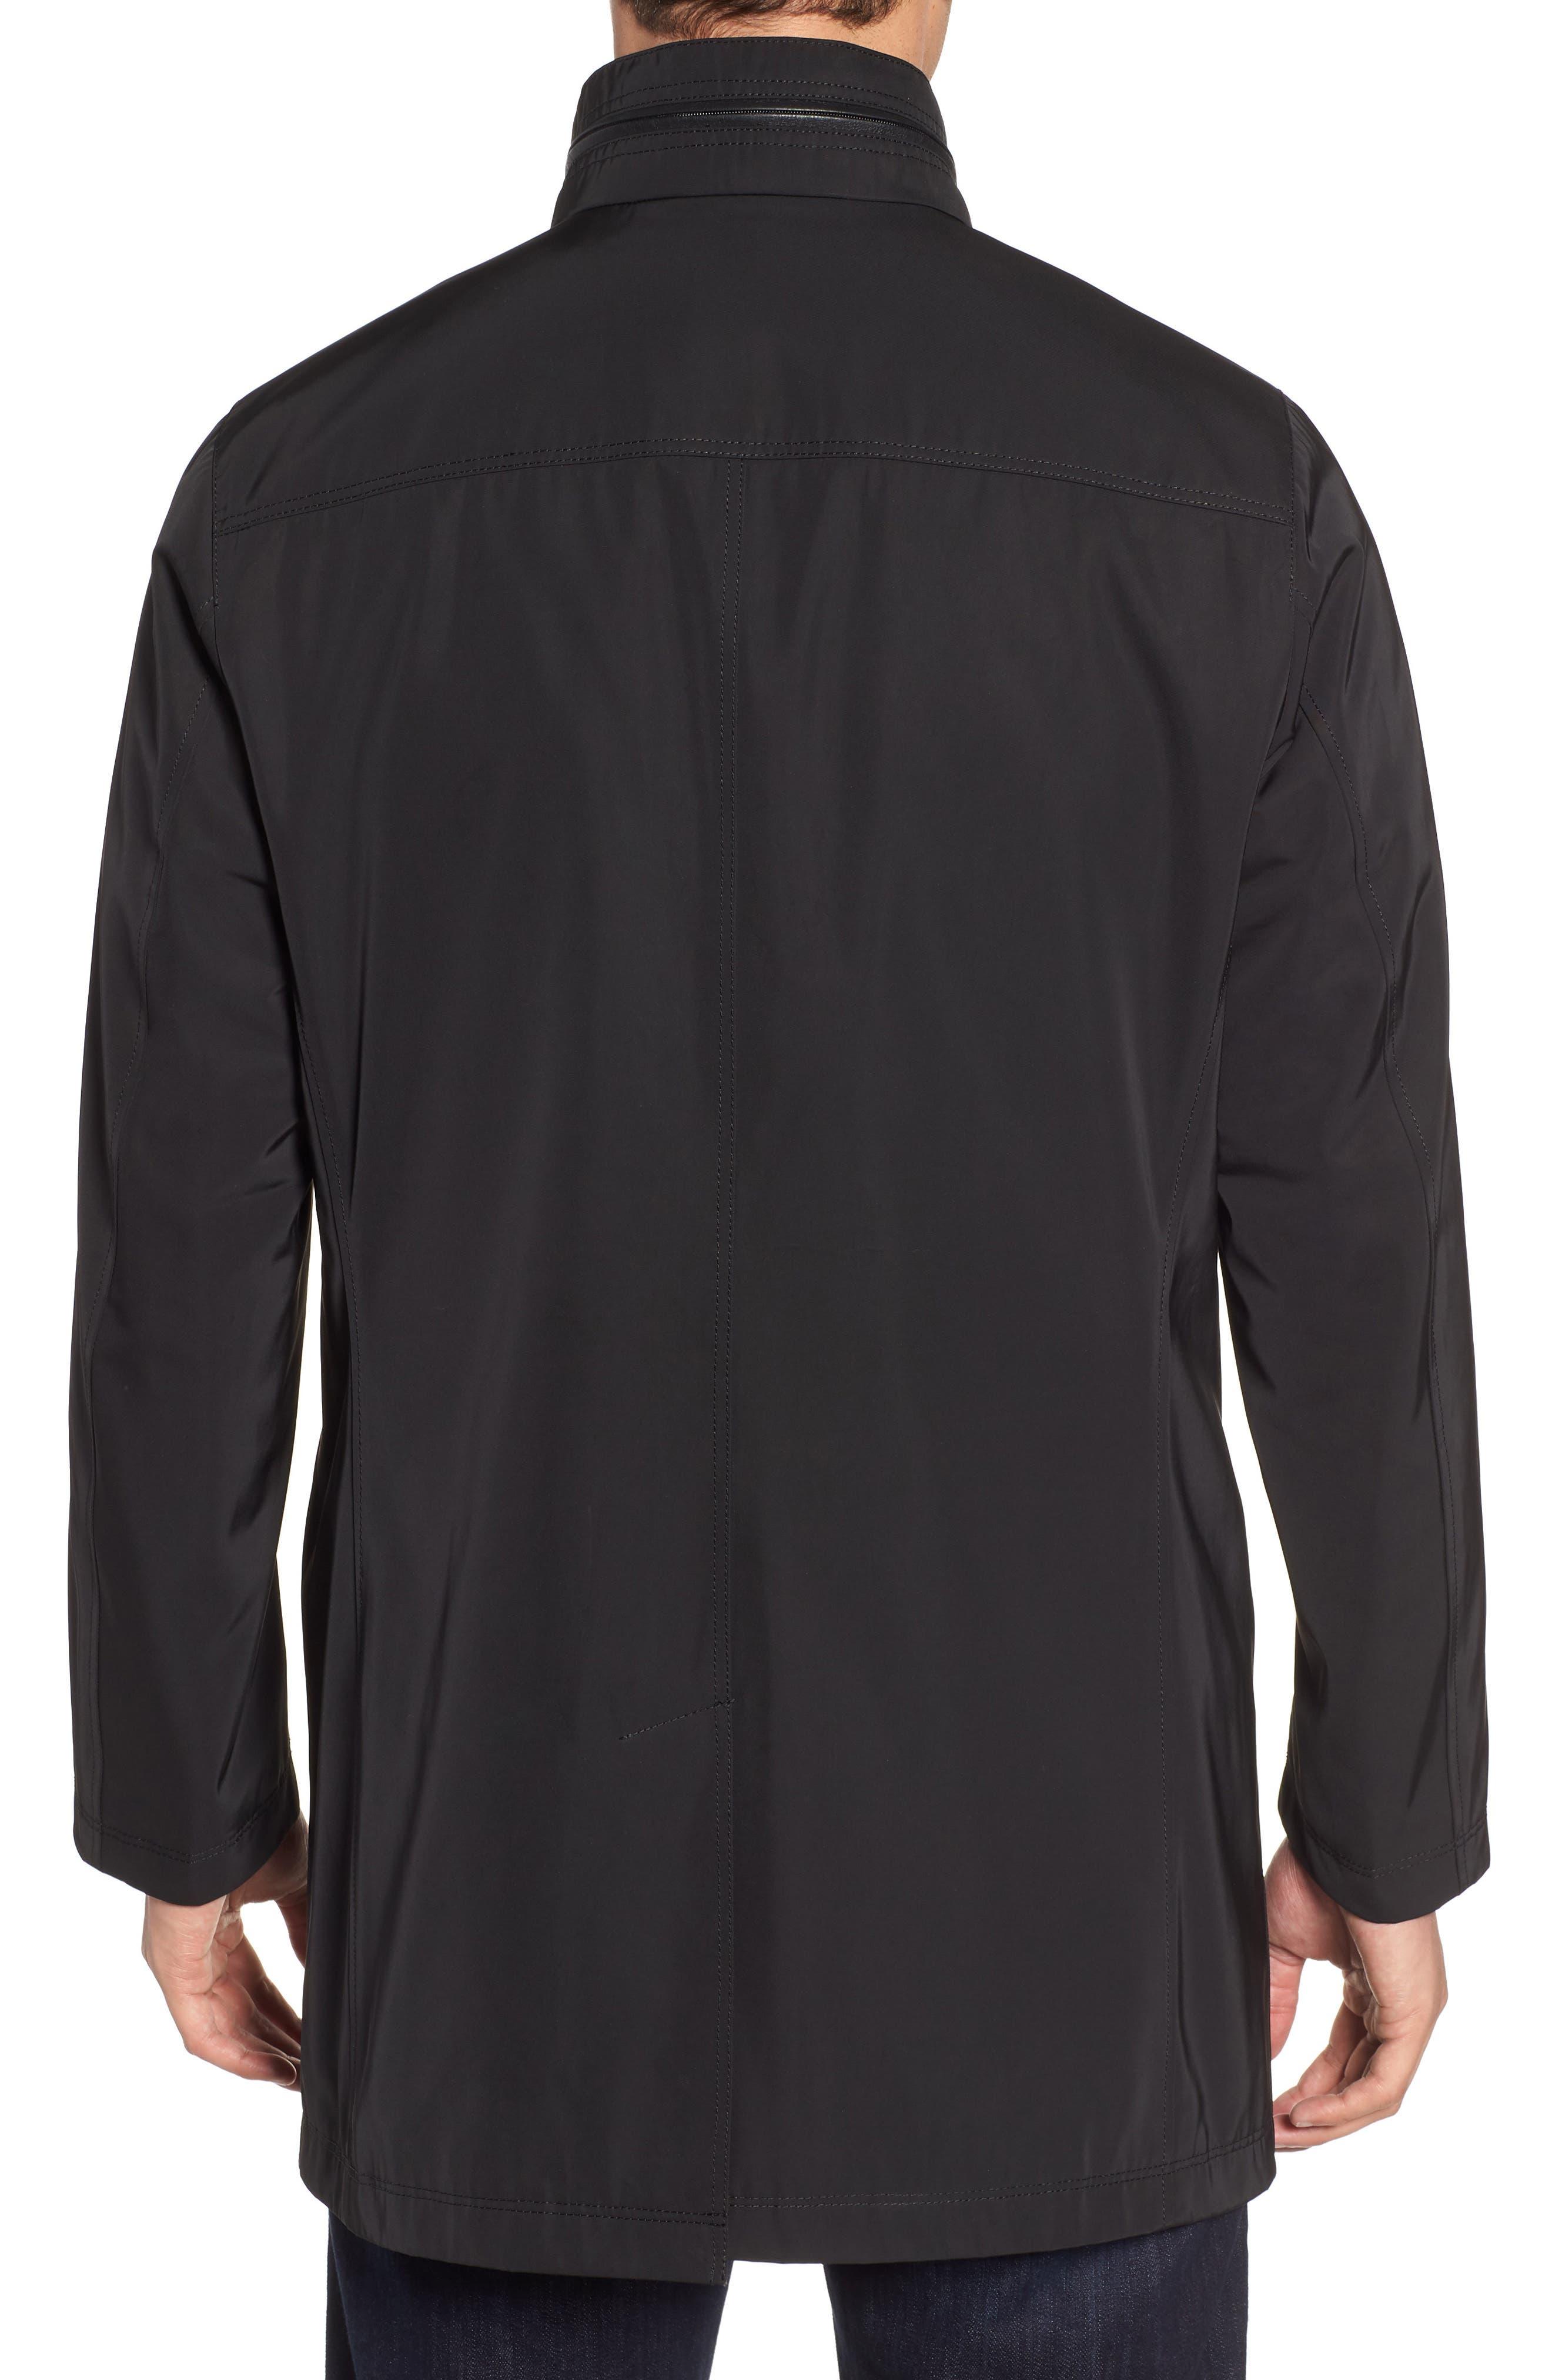 Hardy Getaway Raincoat,                             Alternate thumbnail 2, color,                             BLACK